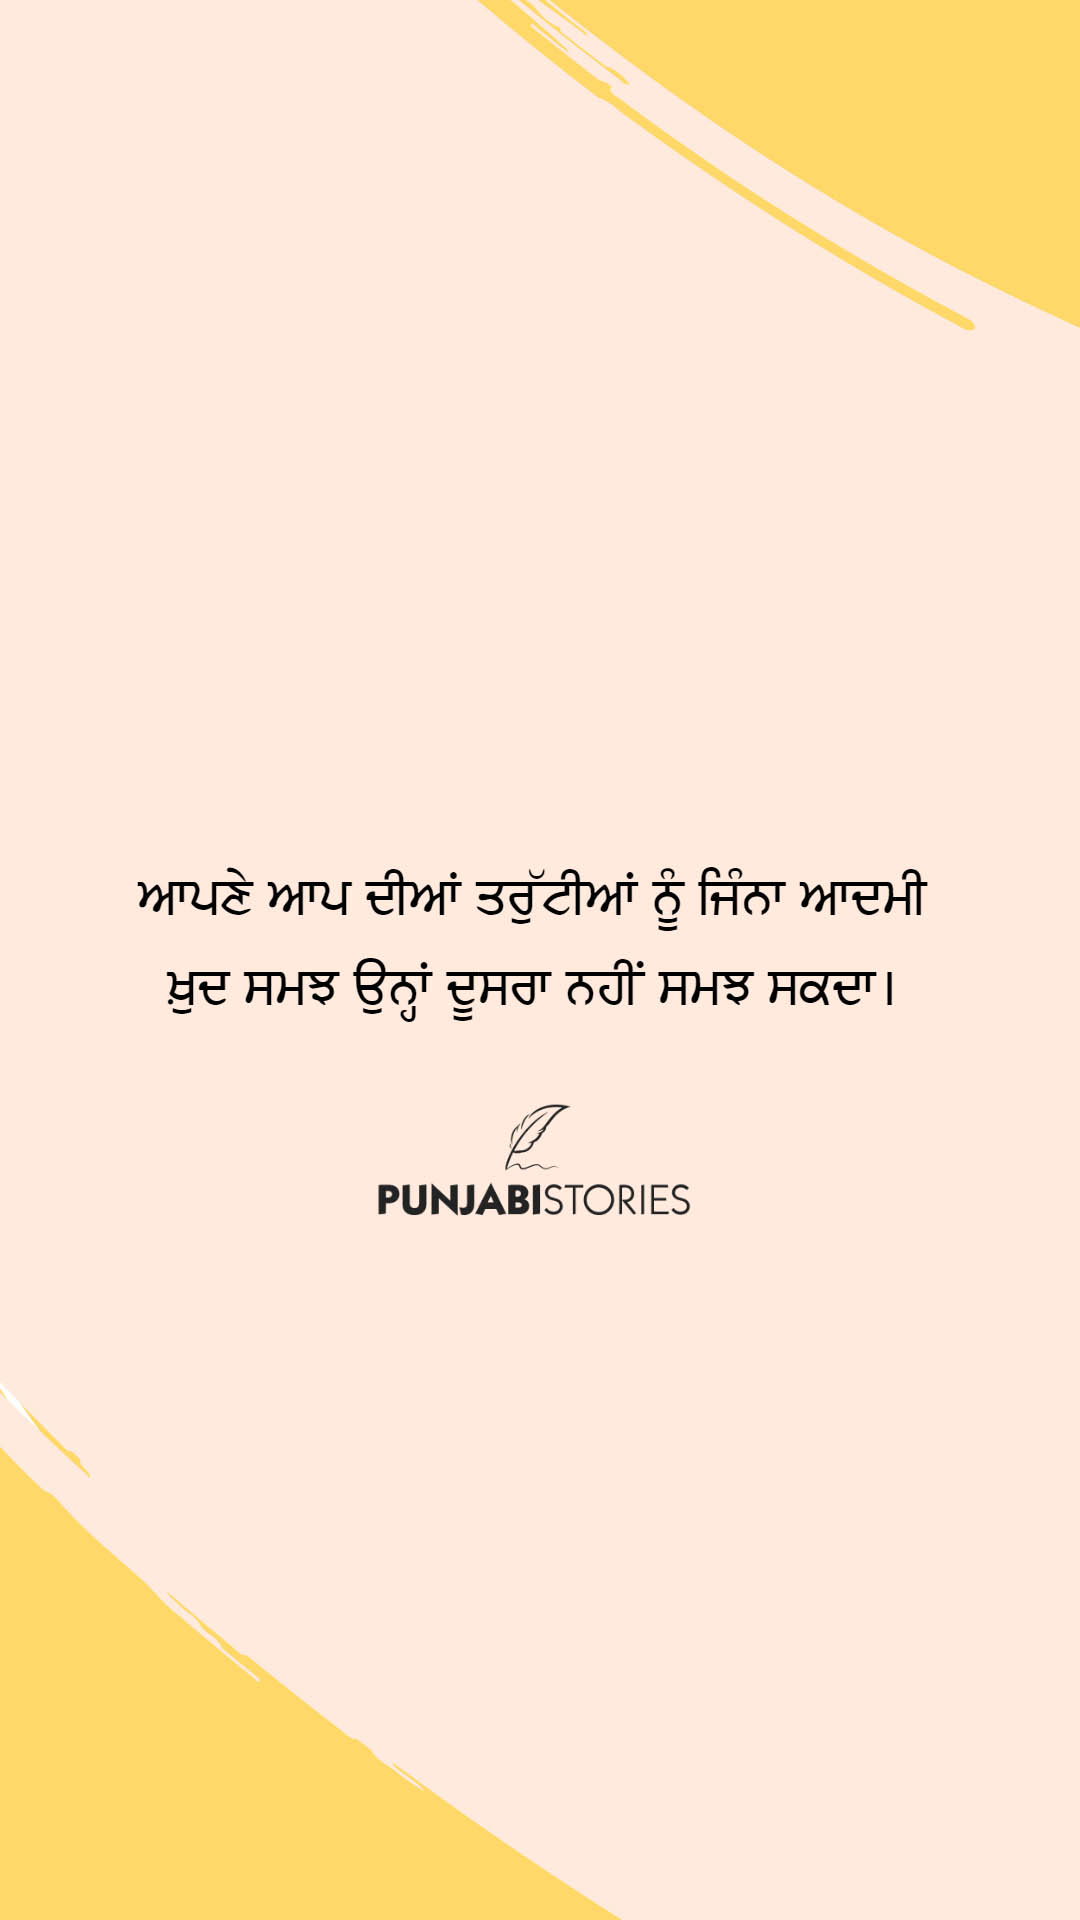 att punjabi status, best punjabi status